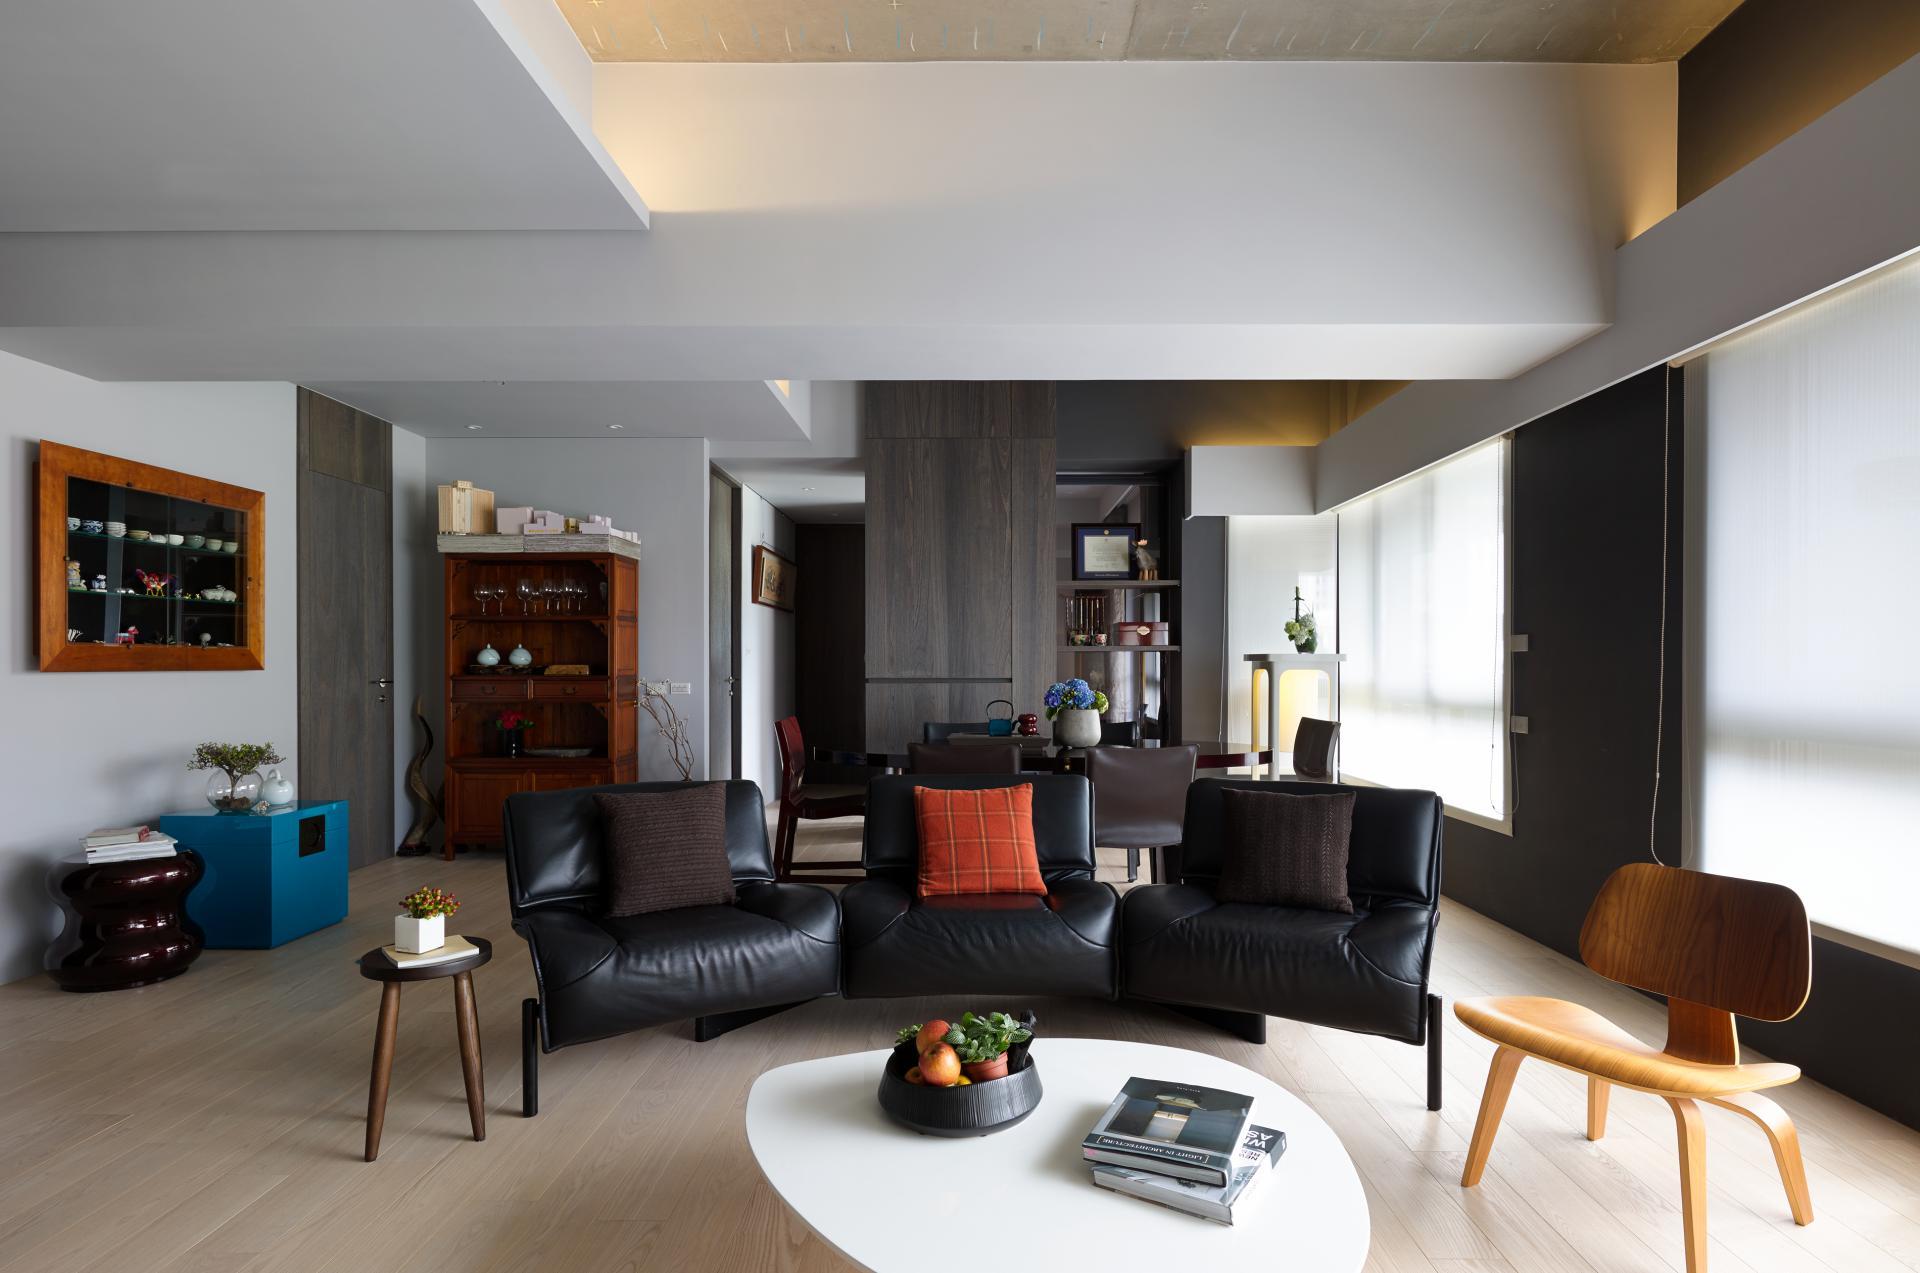 Creative living room furniture